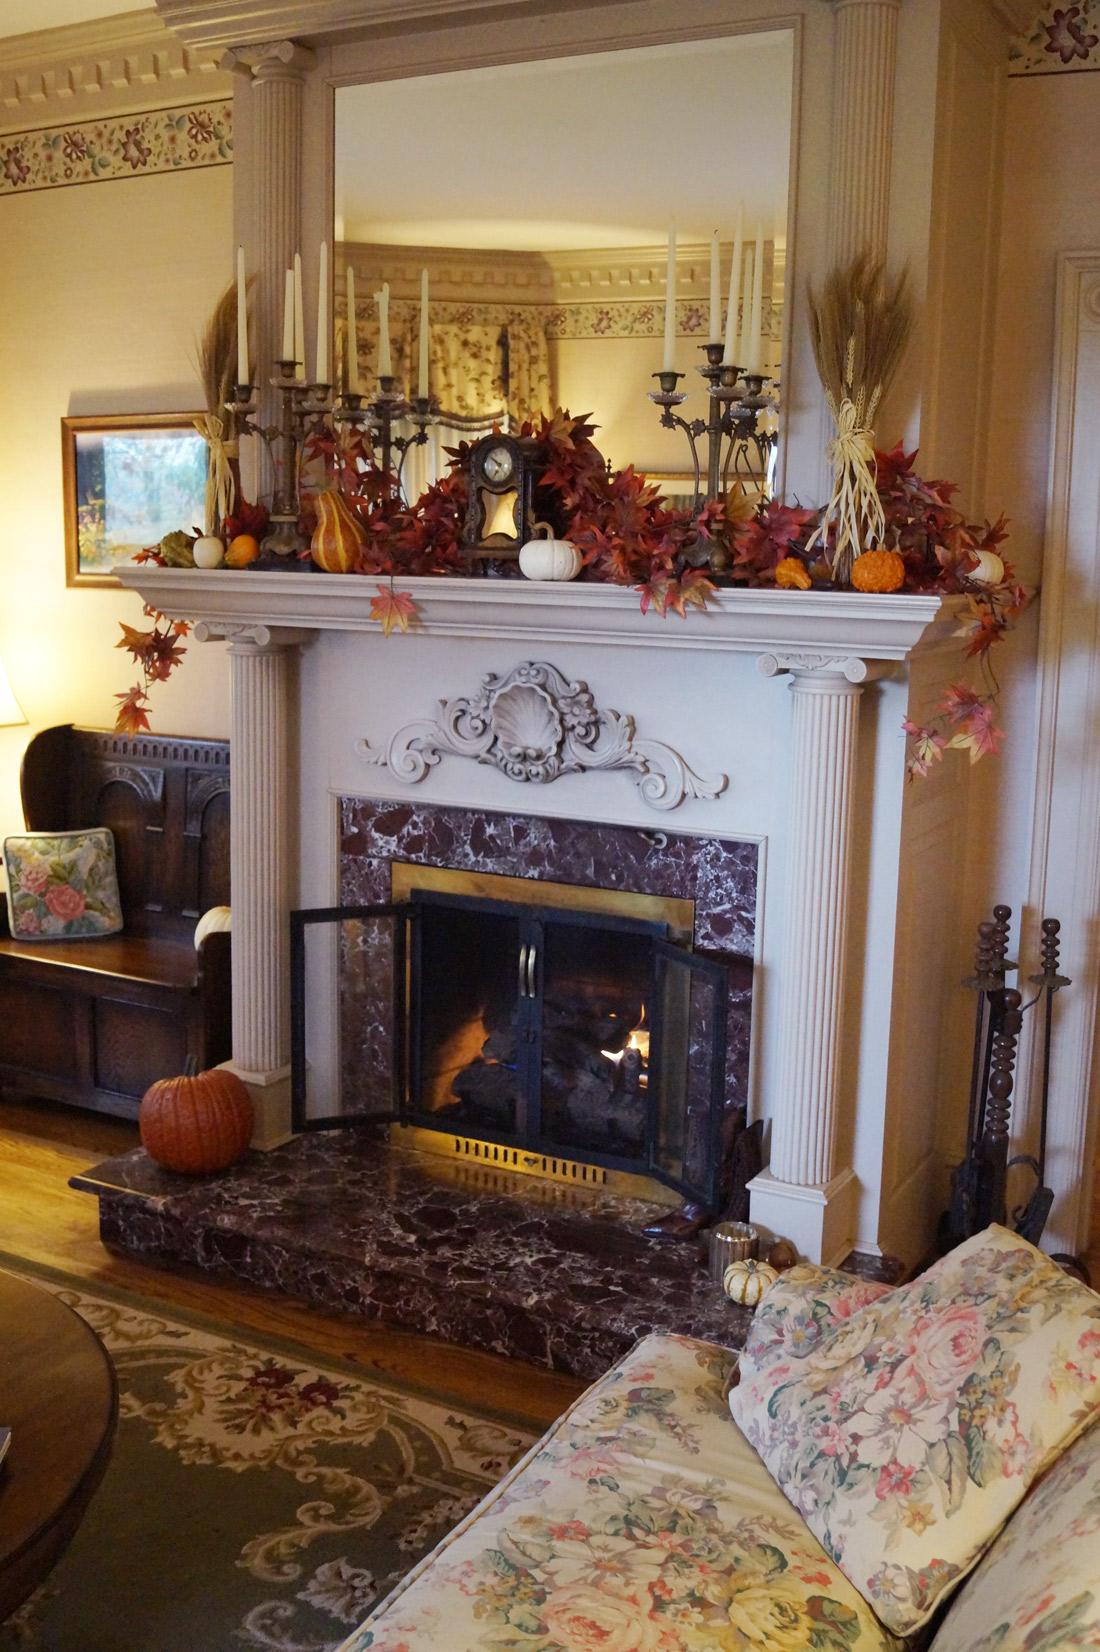 Bag-at-you---Travel-blog---The-Yellow-House-on-Plott-Creek-Rd